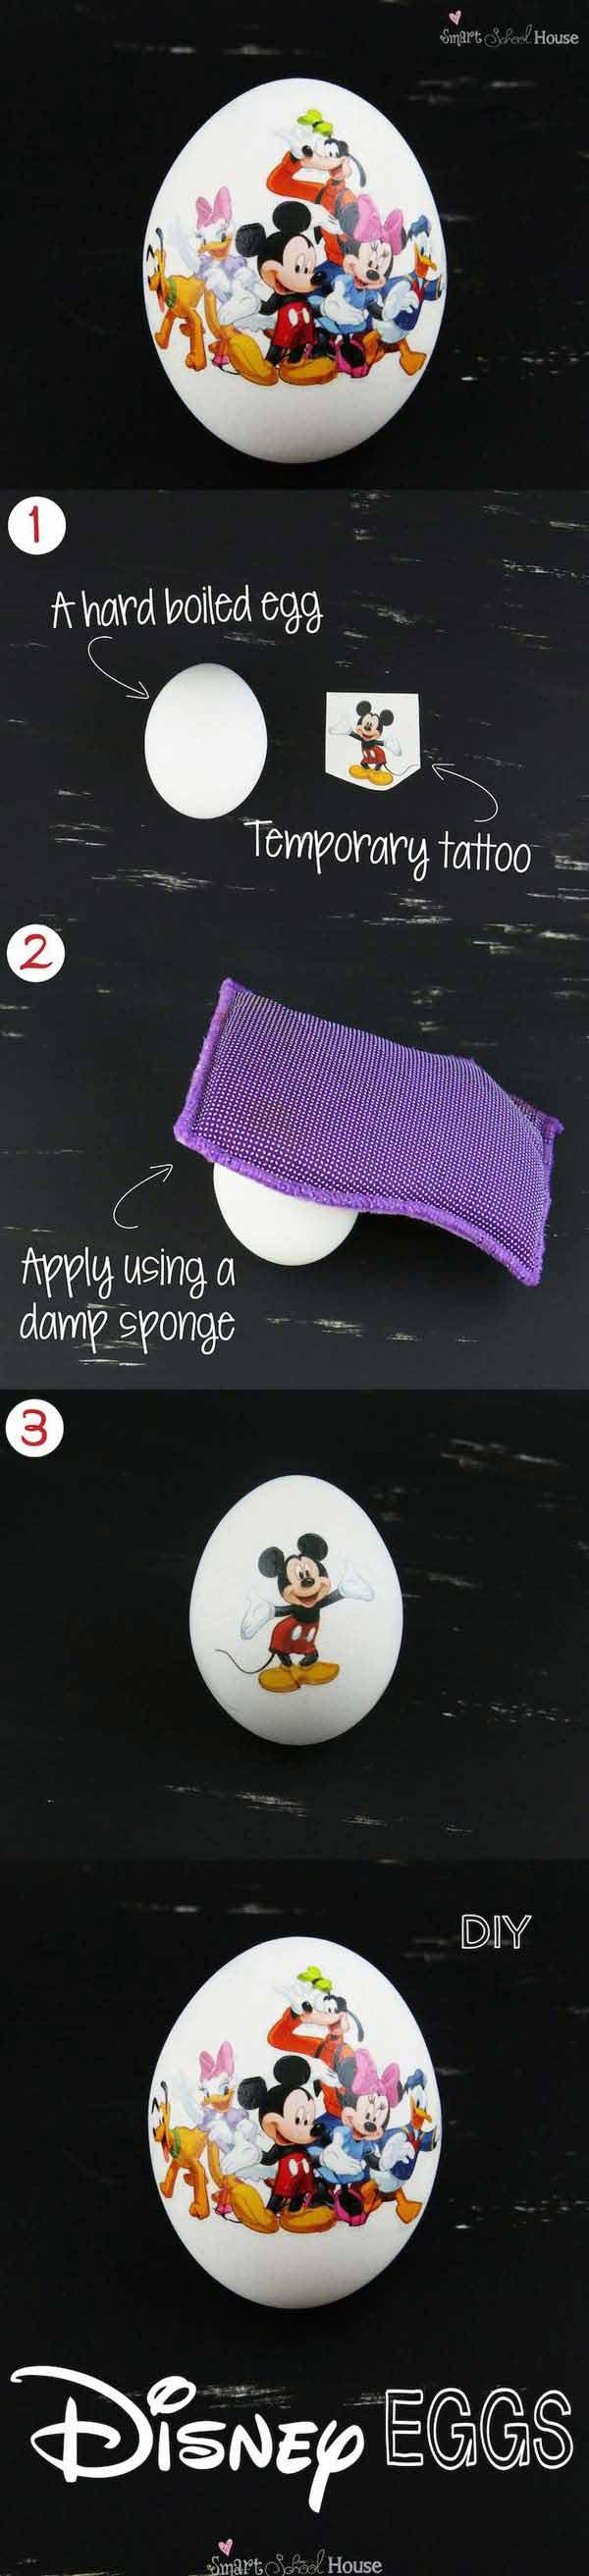 Disney-eggs-Easter-Crafts-for-Kids DIY Cute and Creative Easter Crafts For Kids